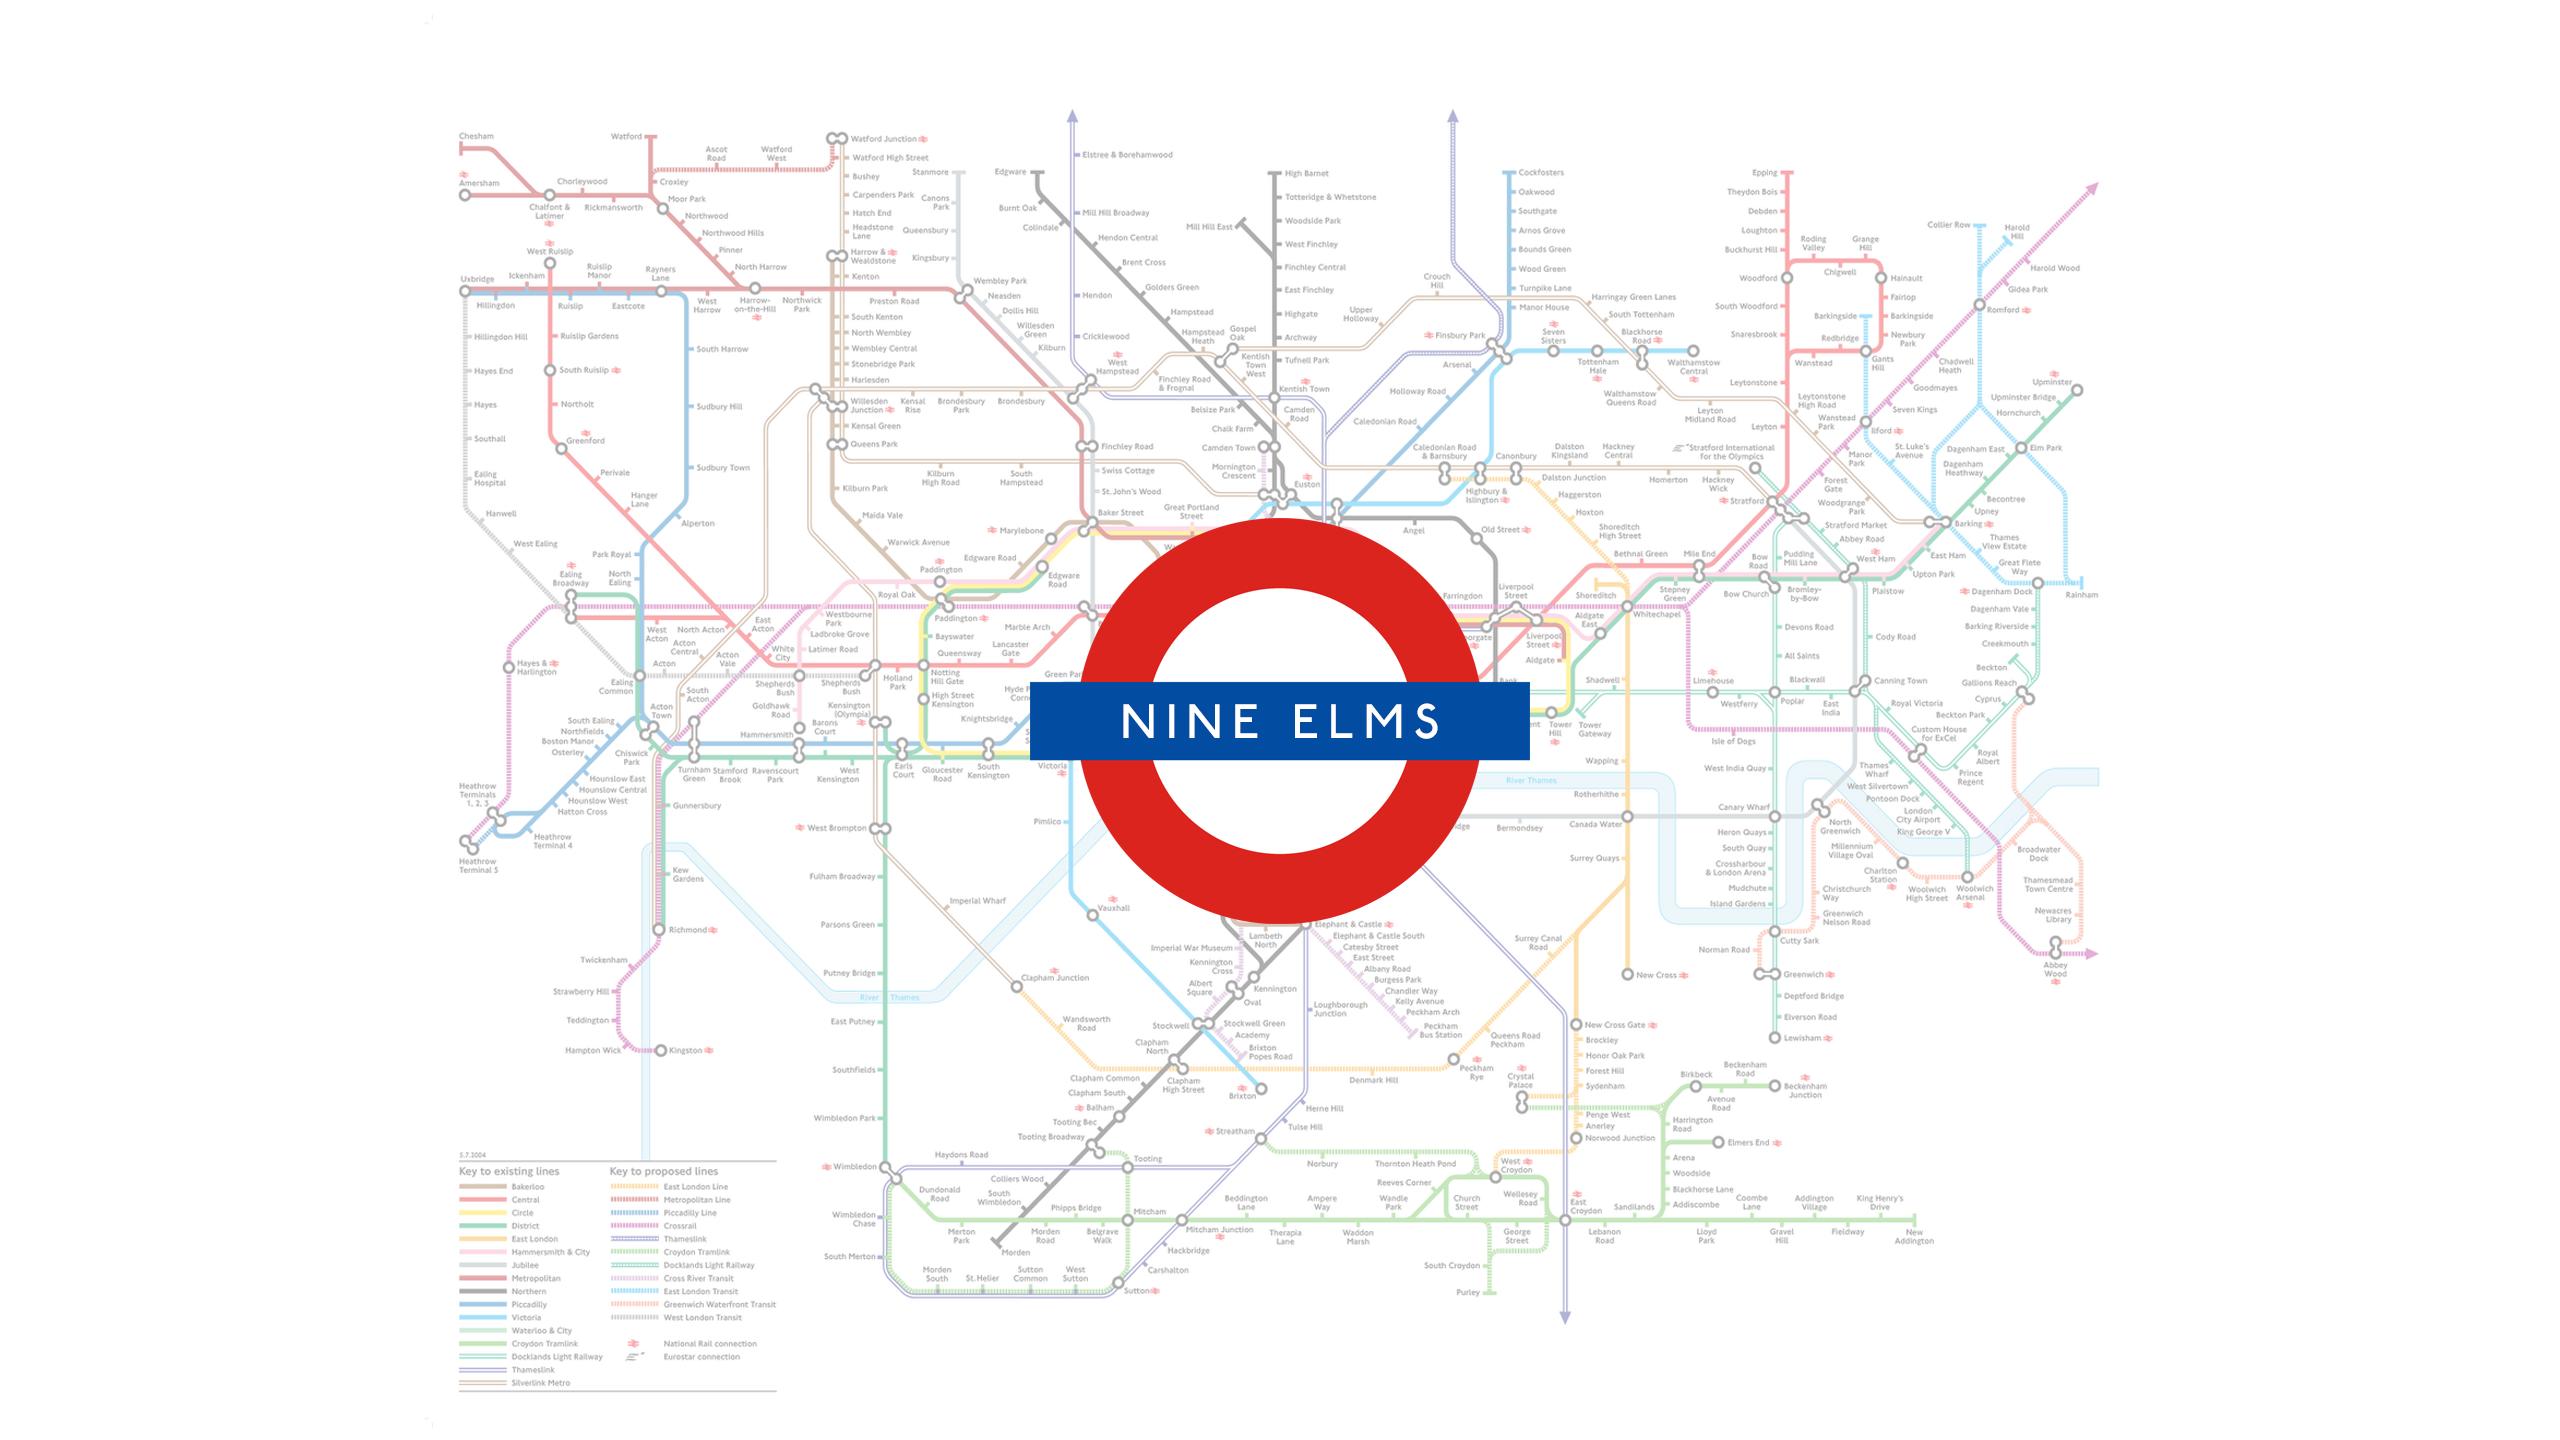 Nine Elms (Map)